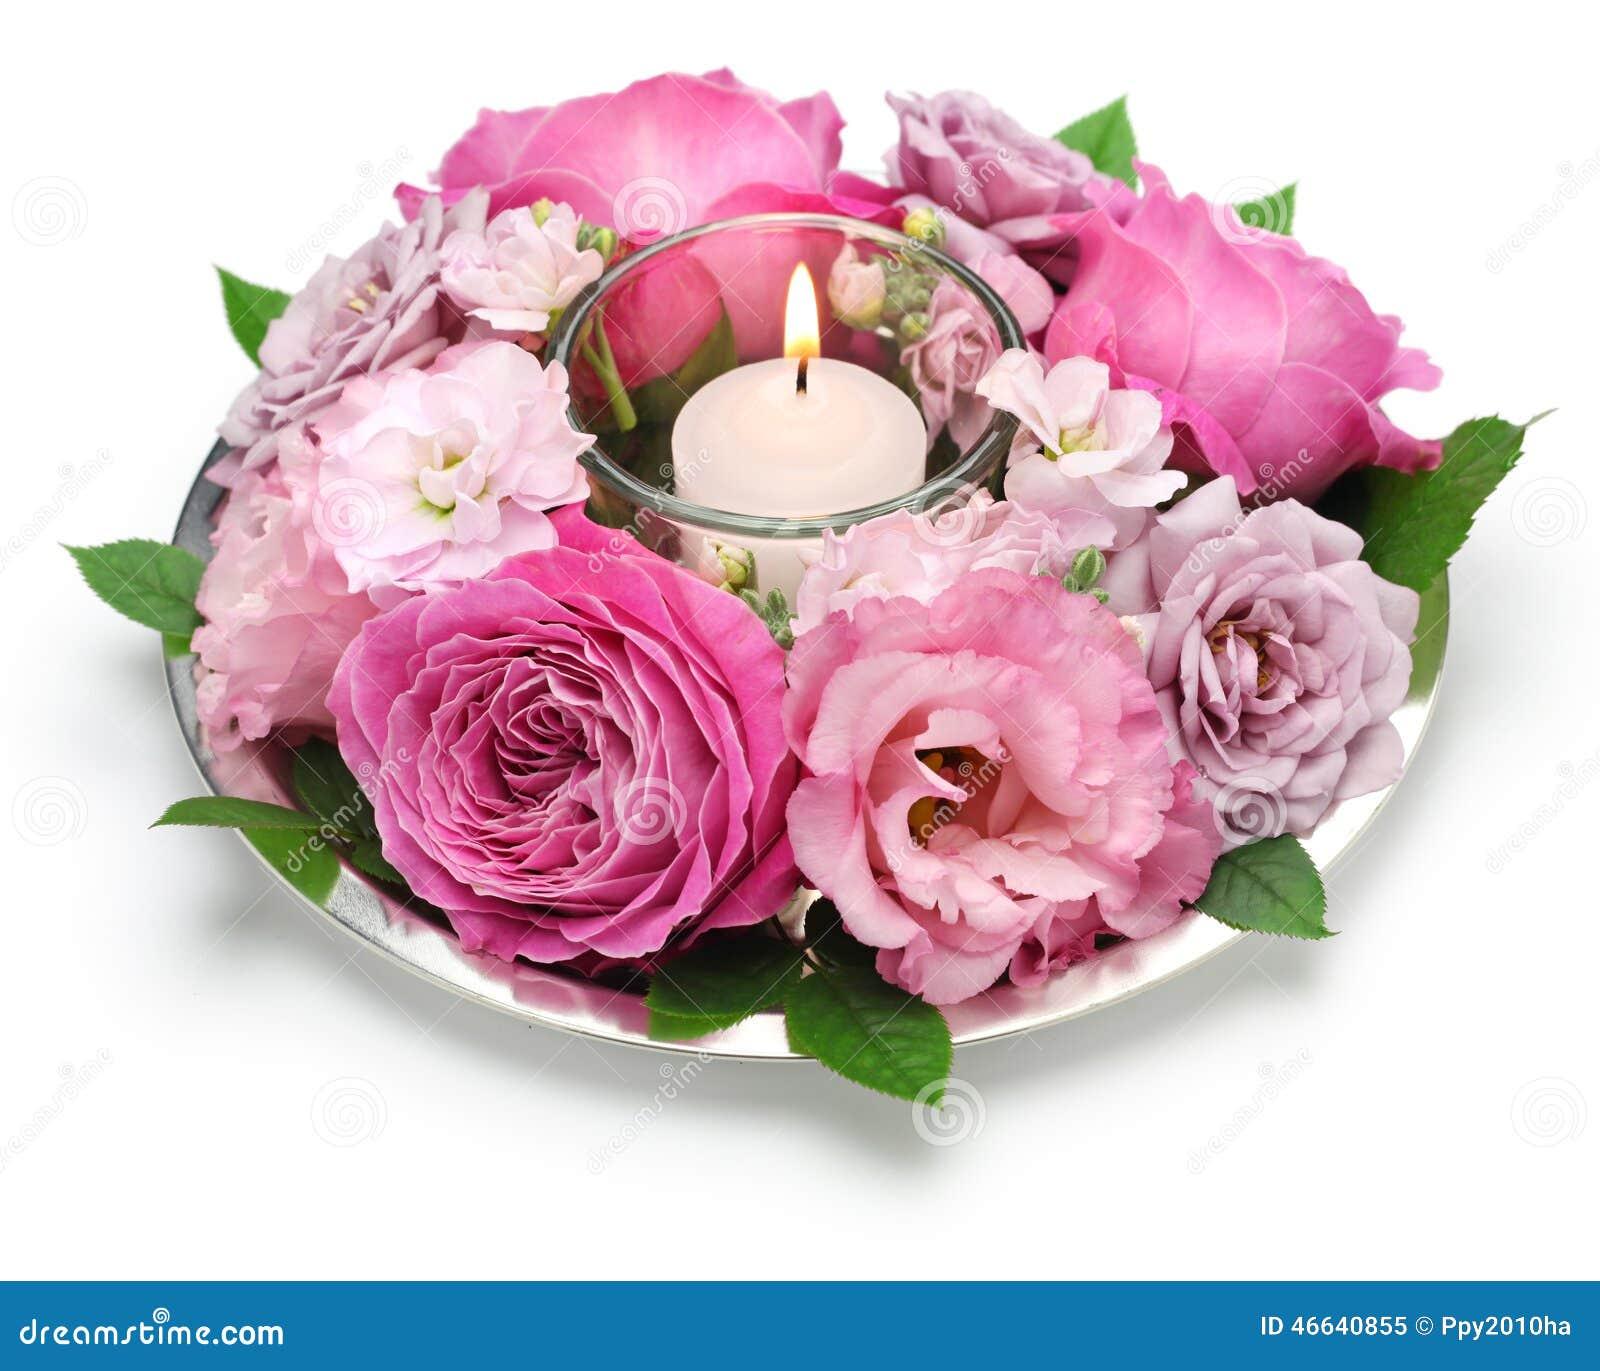 Table flower arrangement with candle stock photo image - Petites compositions florales pour table ...